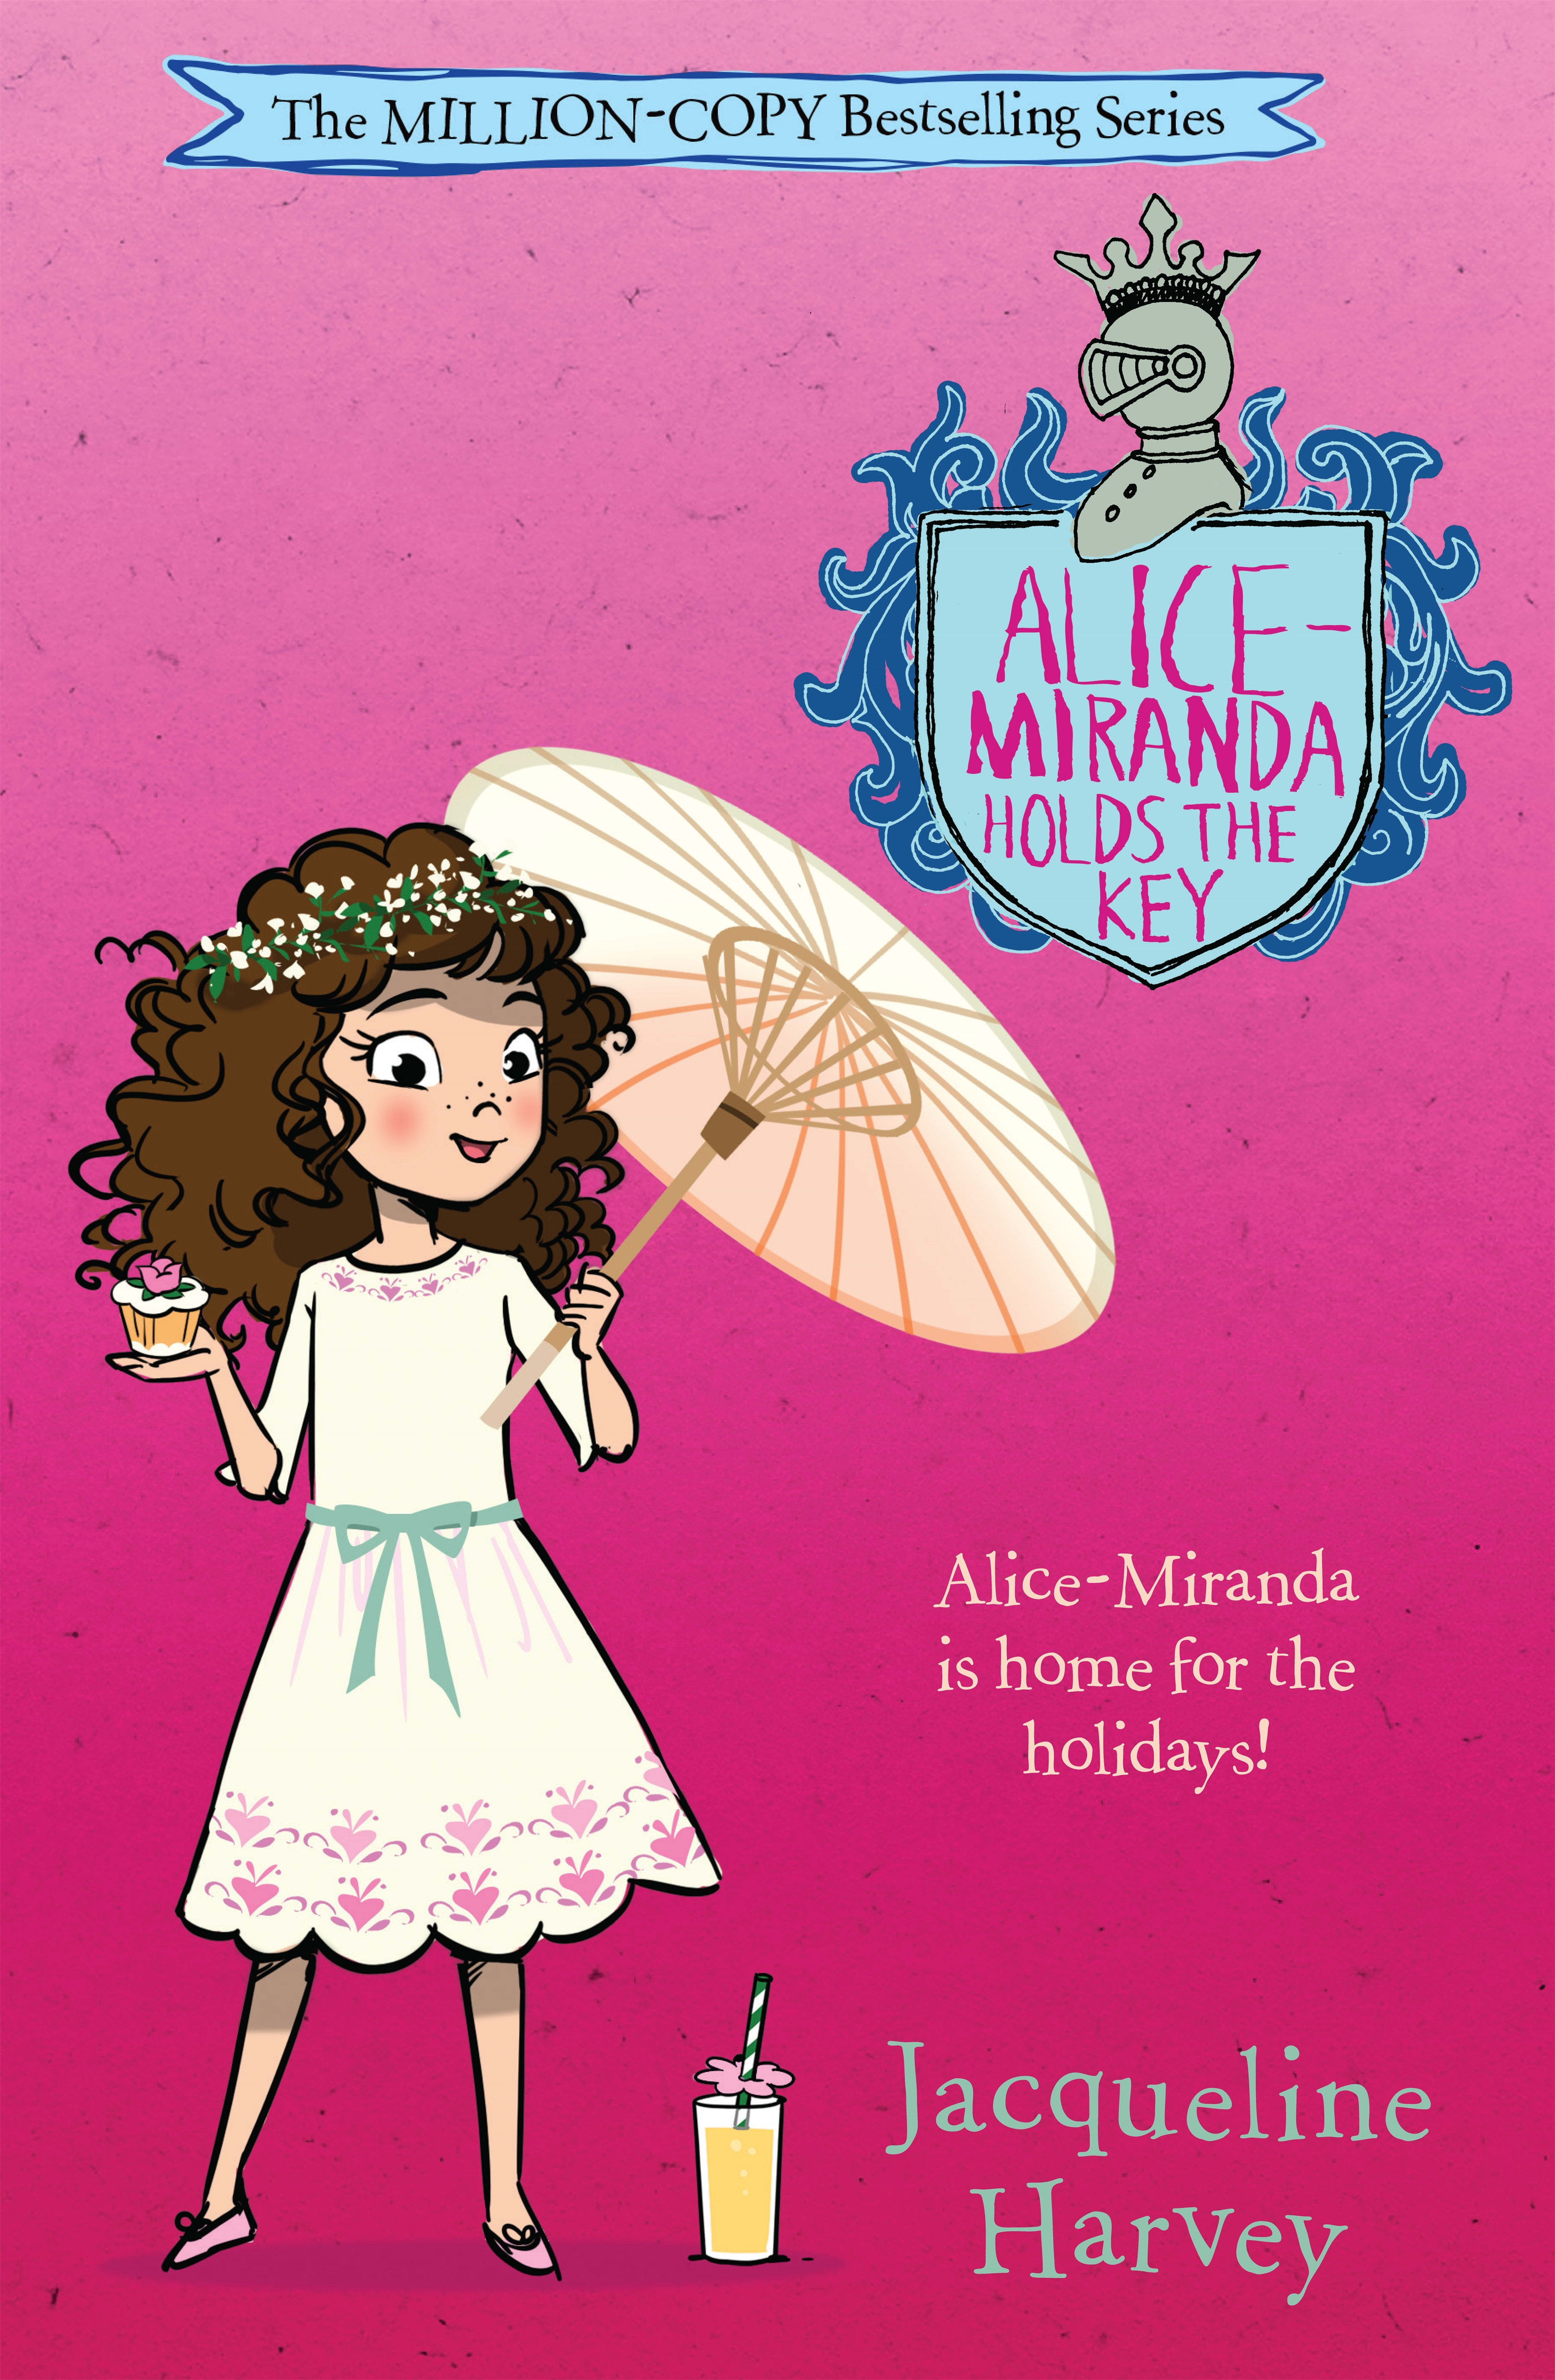 Alice-Miranda Holds the Key